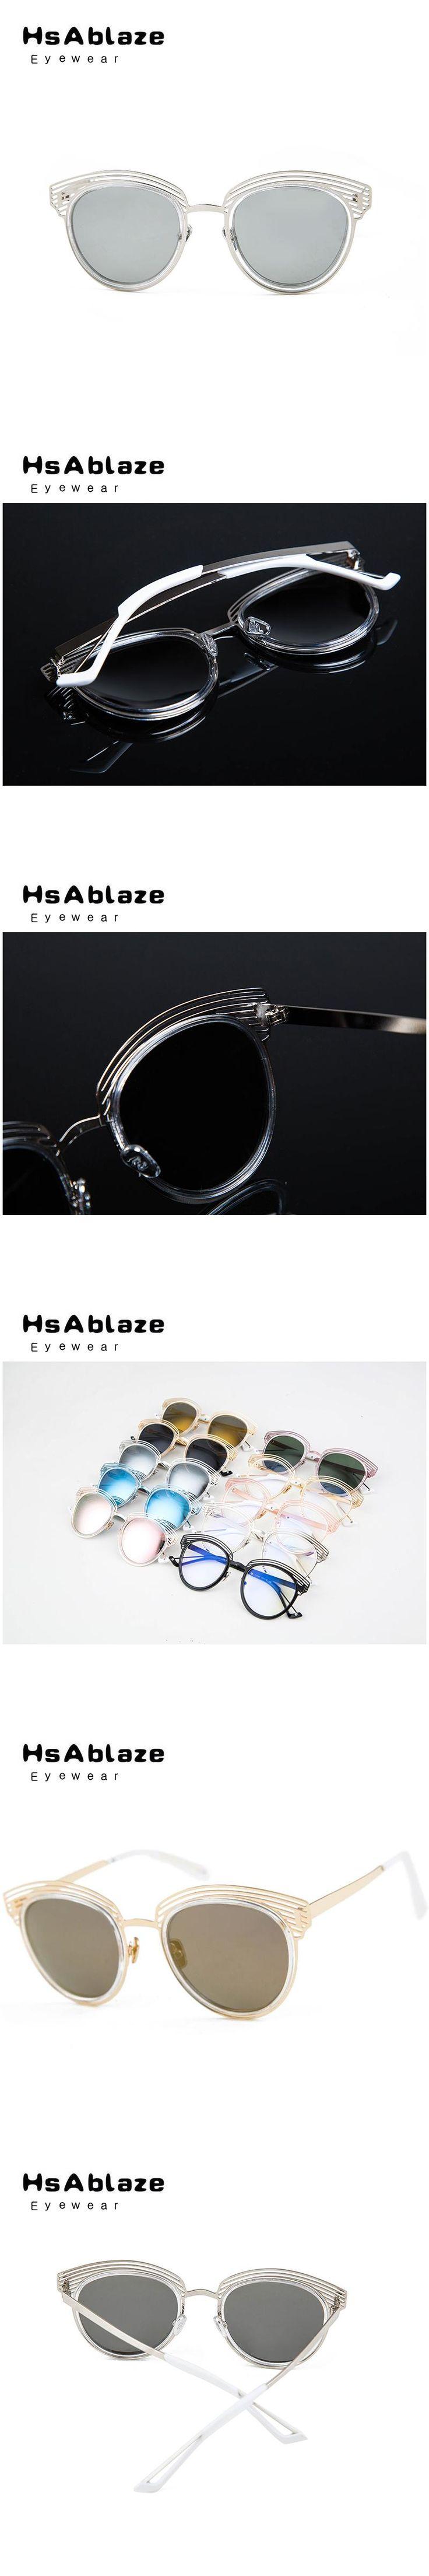 HsAblaze Eyewear Pink Gold Mirror Sunglasses 2017 Women Metal Hollow Out Vintage Brand Designer Women Sunglass Glasses Frame